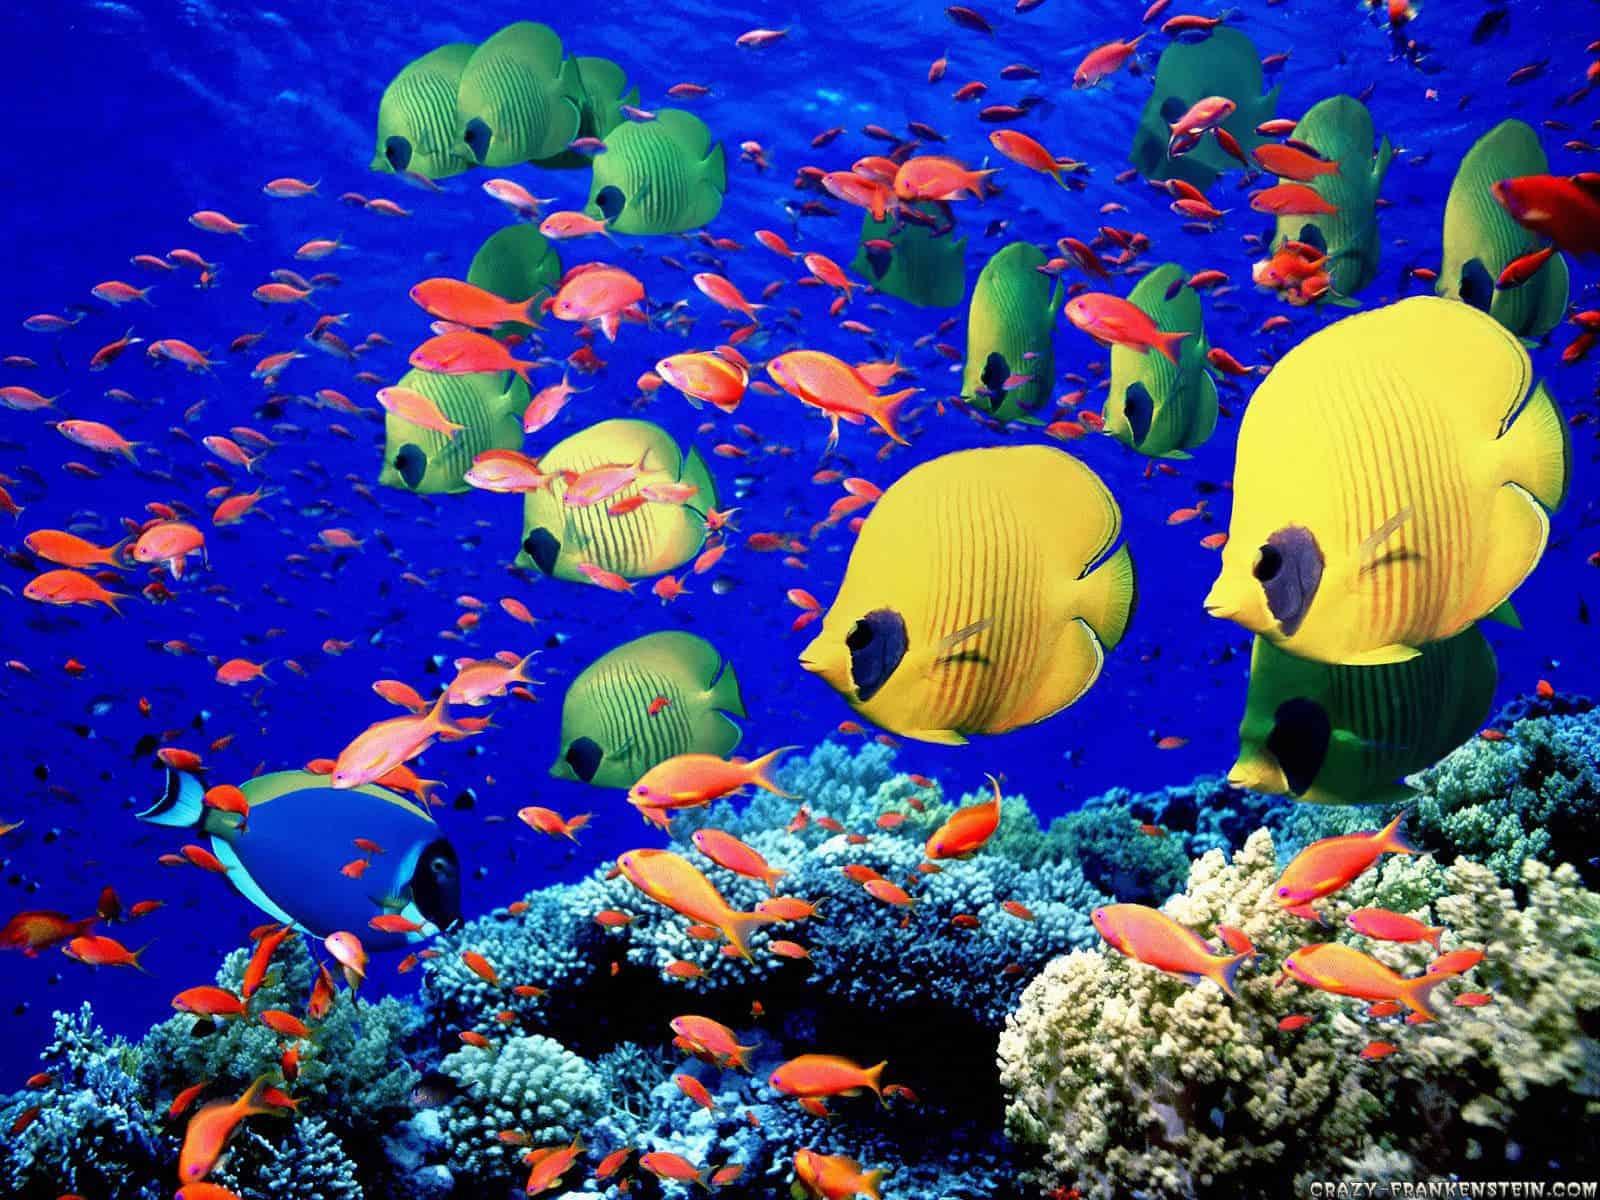 new study estimates 1 million marine species   one third